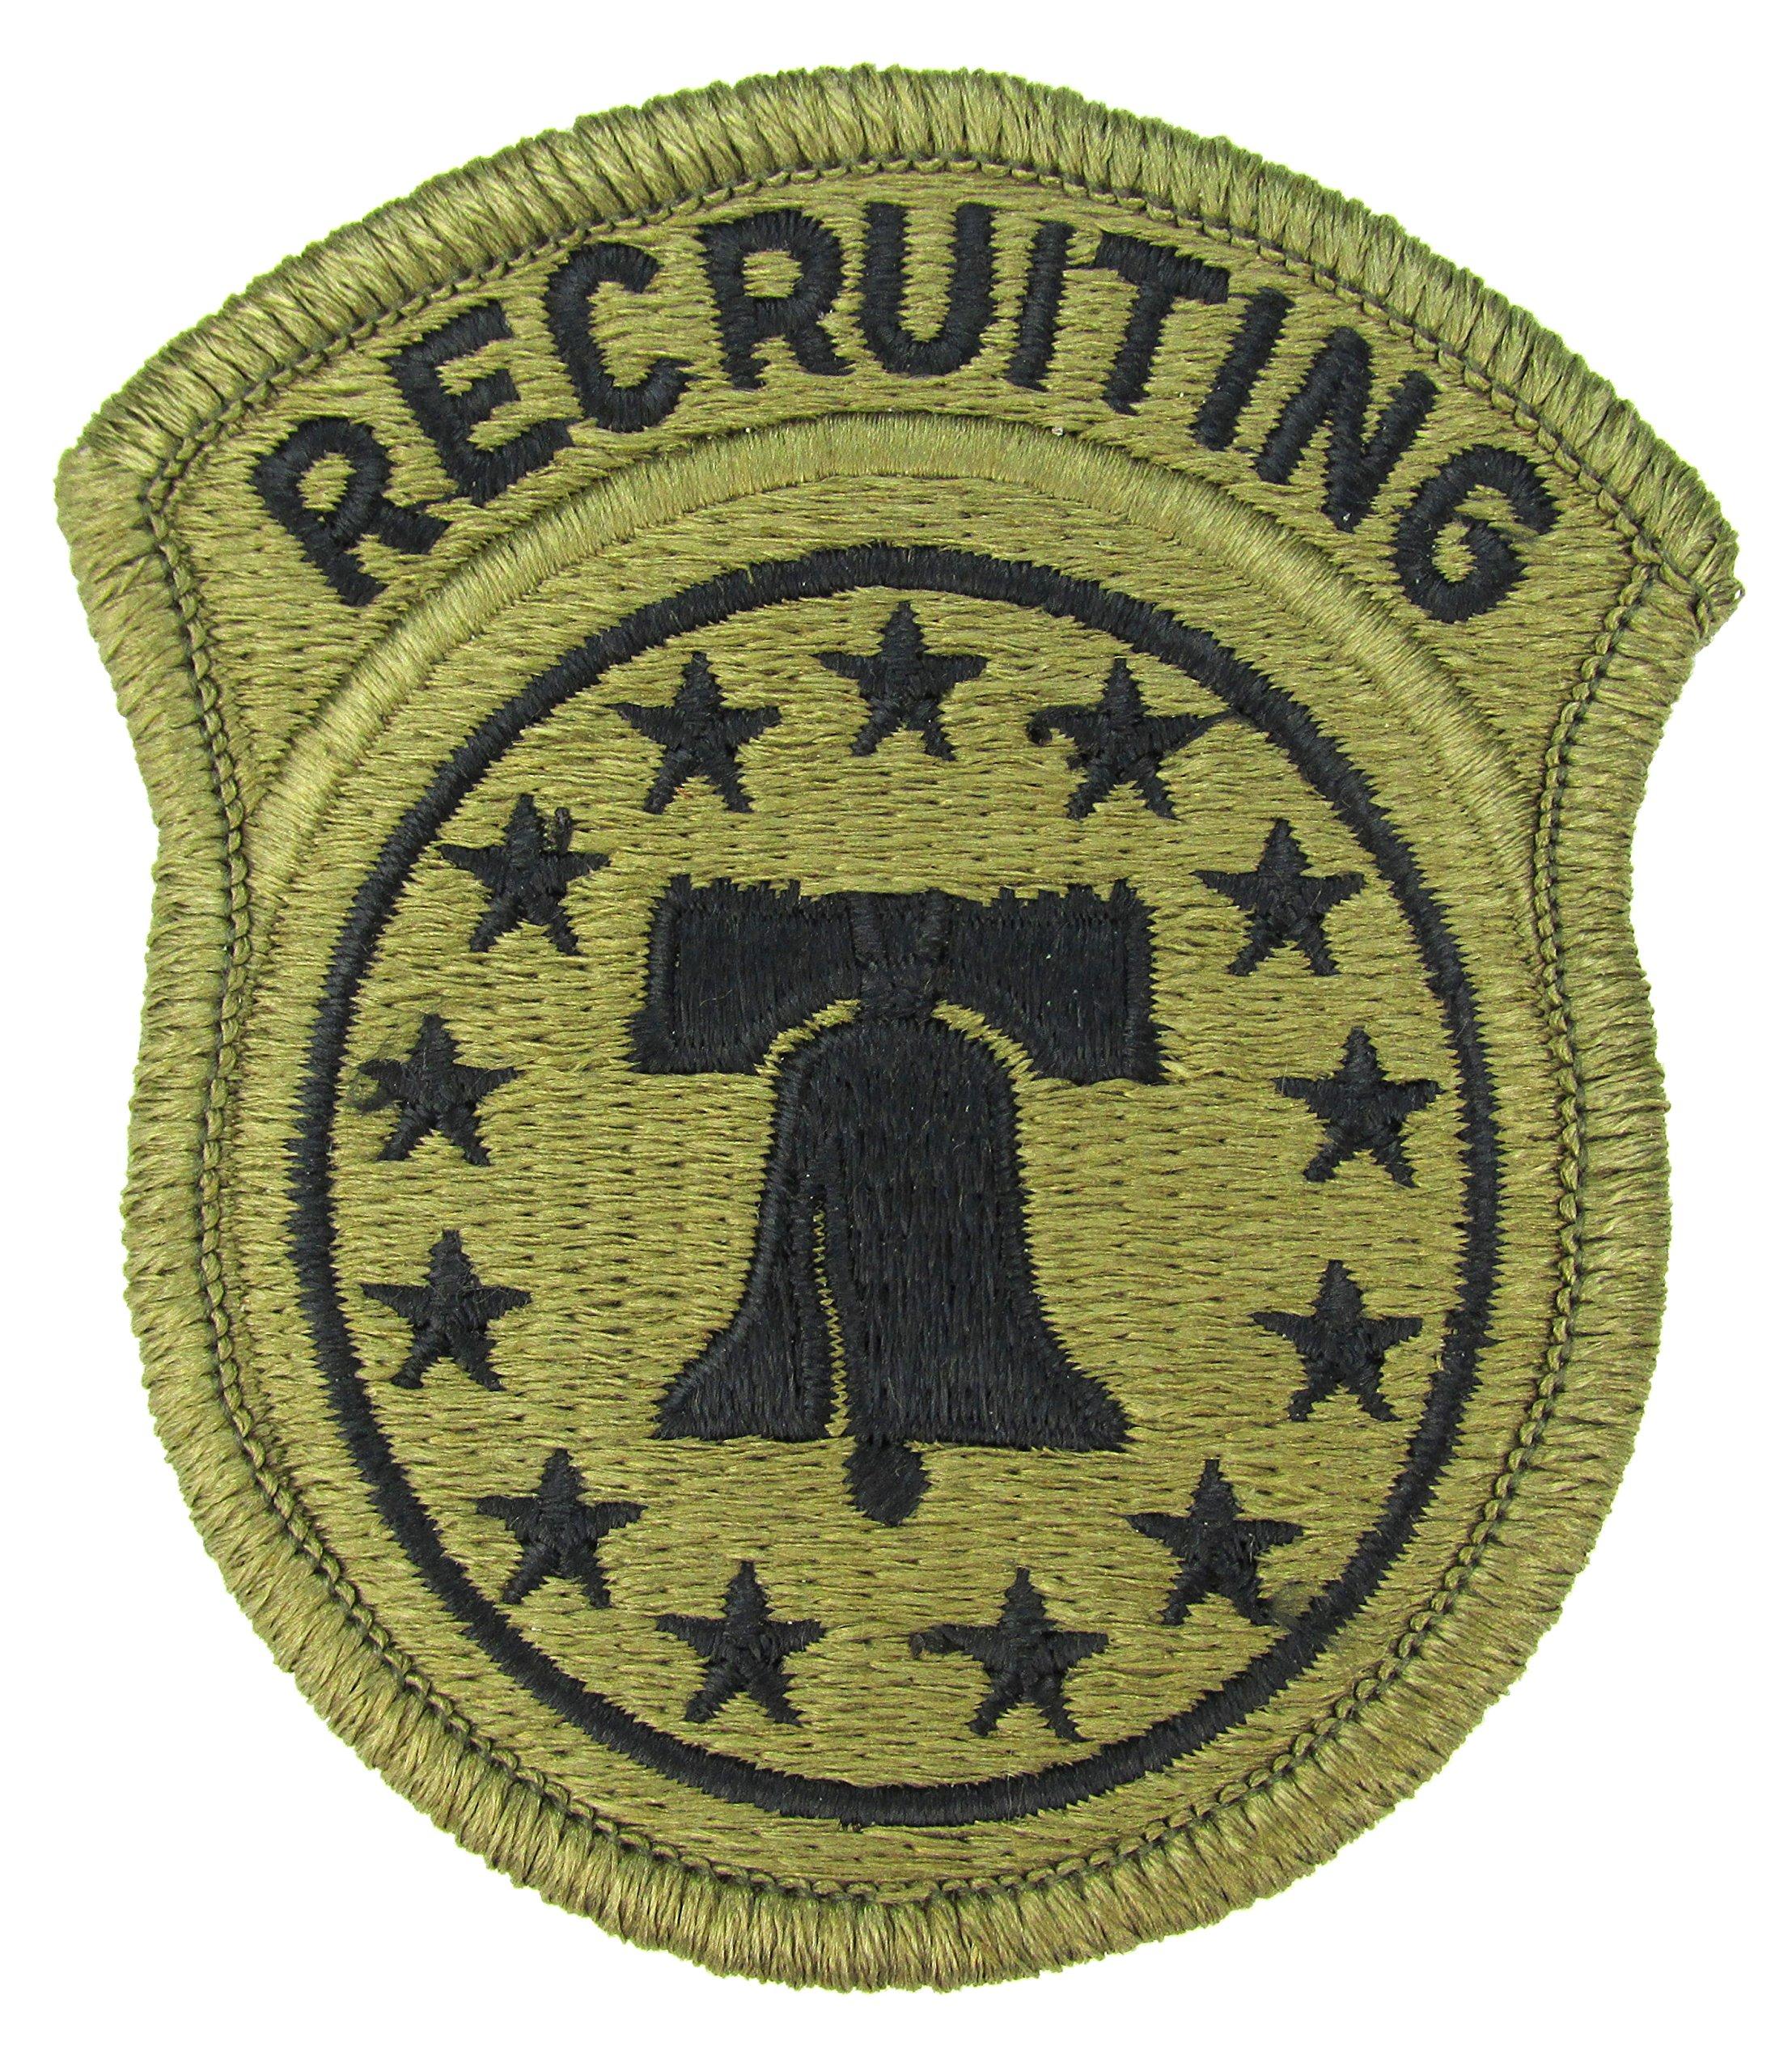 US Recruiting Command OCP Patch - Scorpion W2